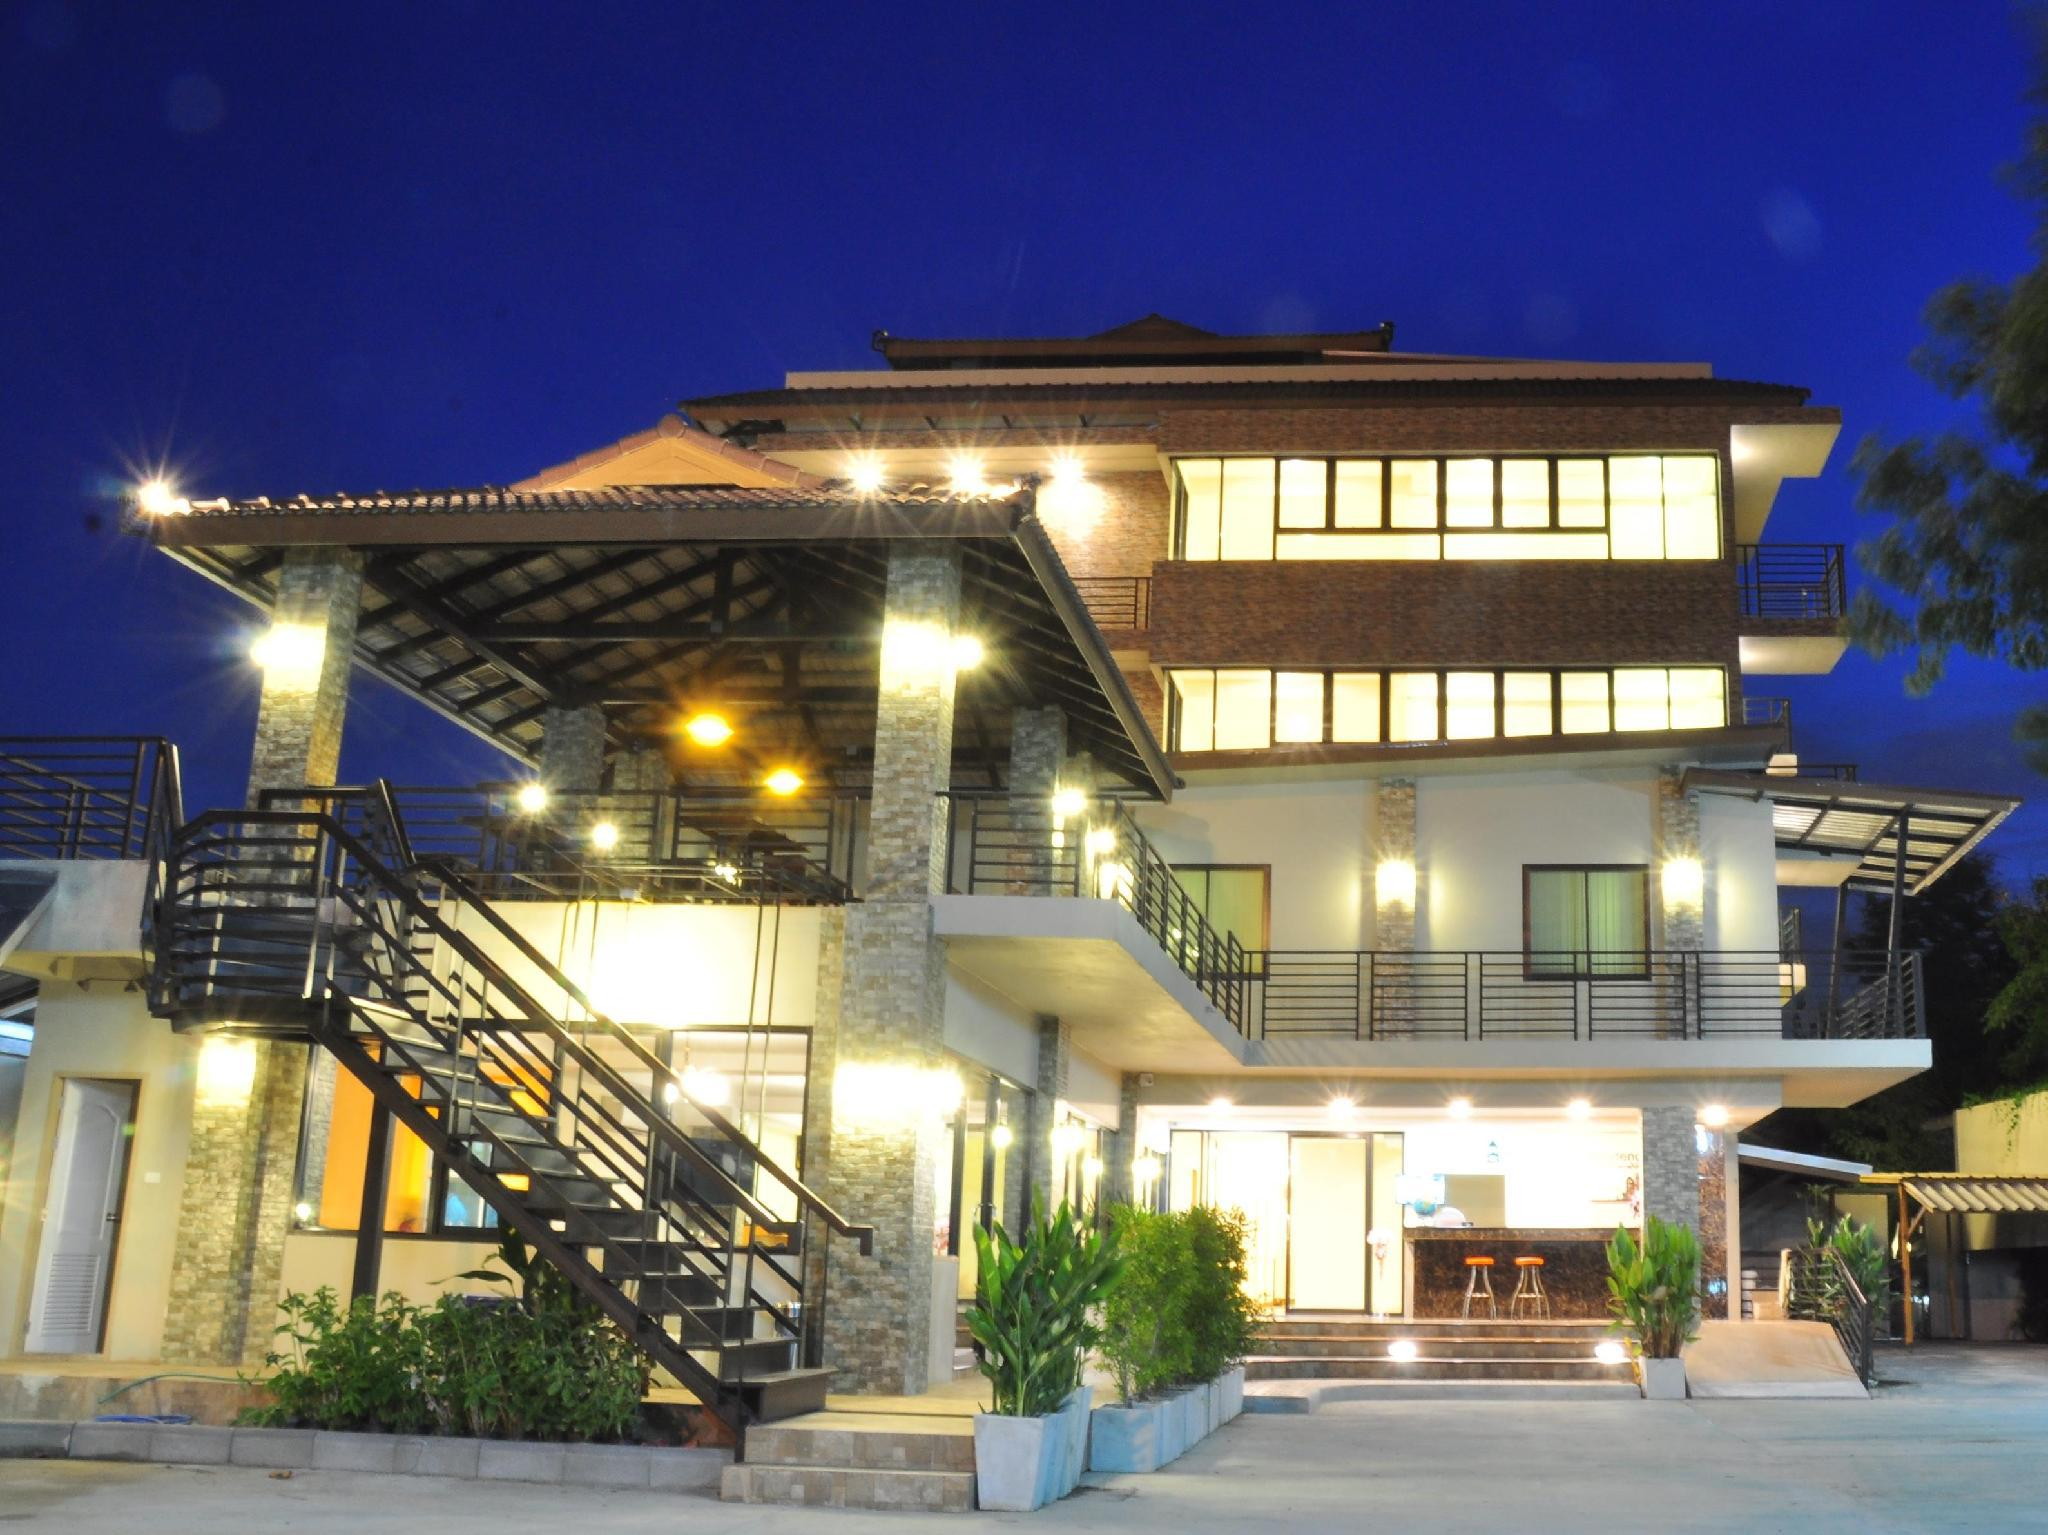 The Bloom Residence at Suvarnabhumi เดอะ บลูม เรสซิเดนซ์ แอท สุวรรณภูมิ